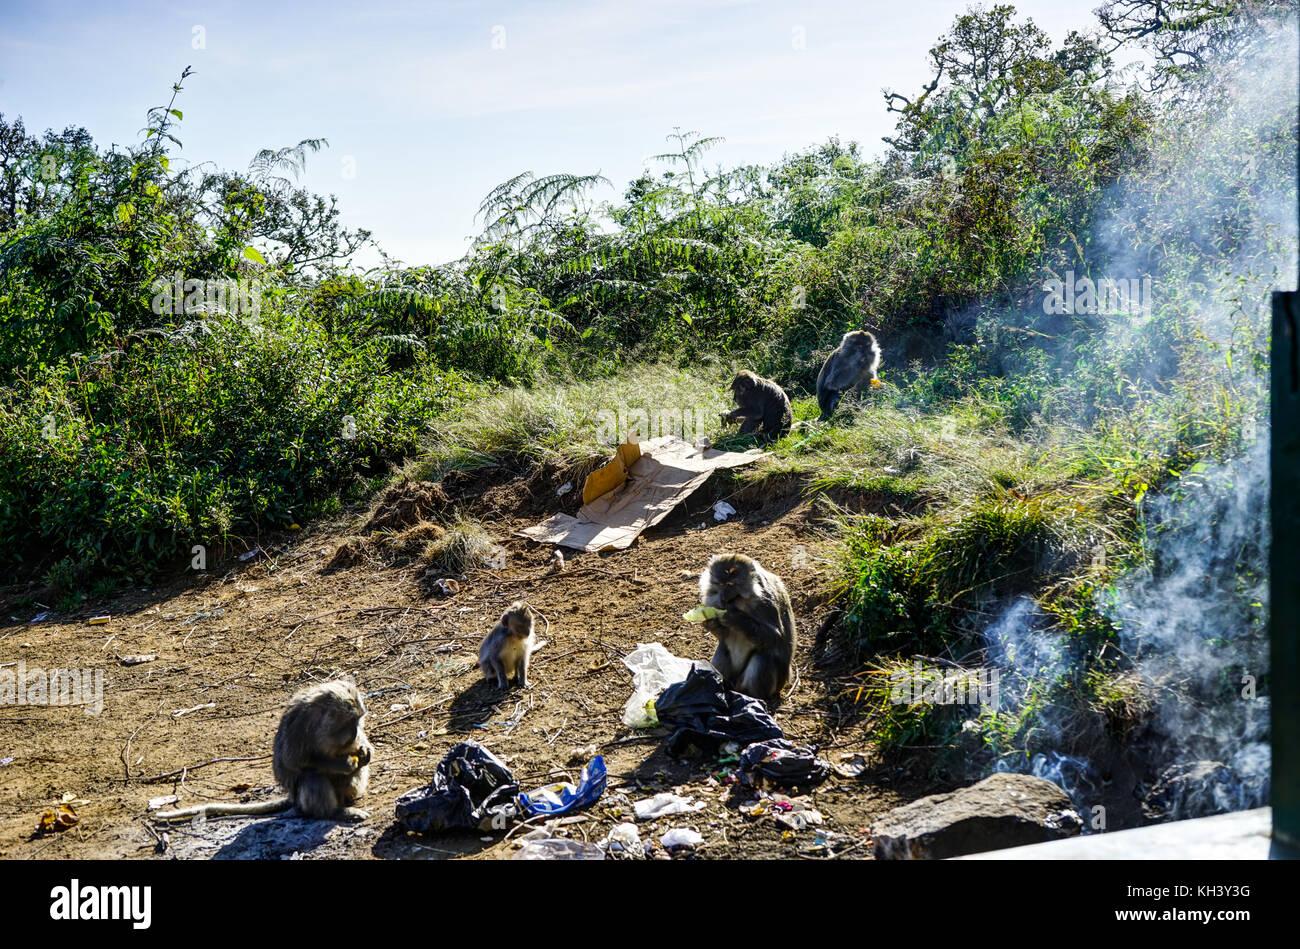 Affe essen Mount Rinjani auf Lombok Indonesien Stockfoto